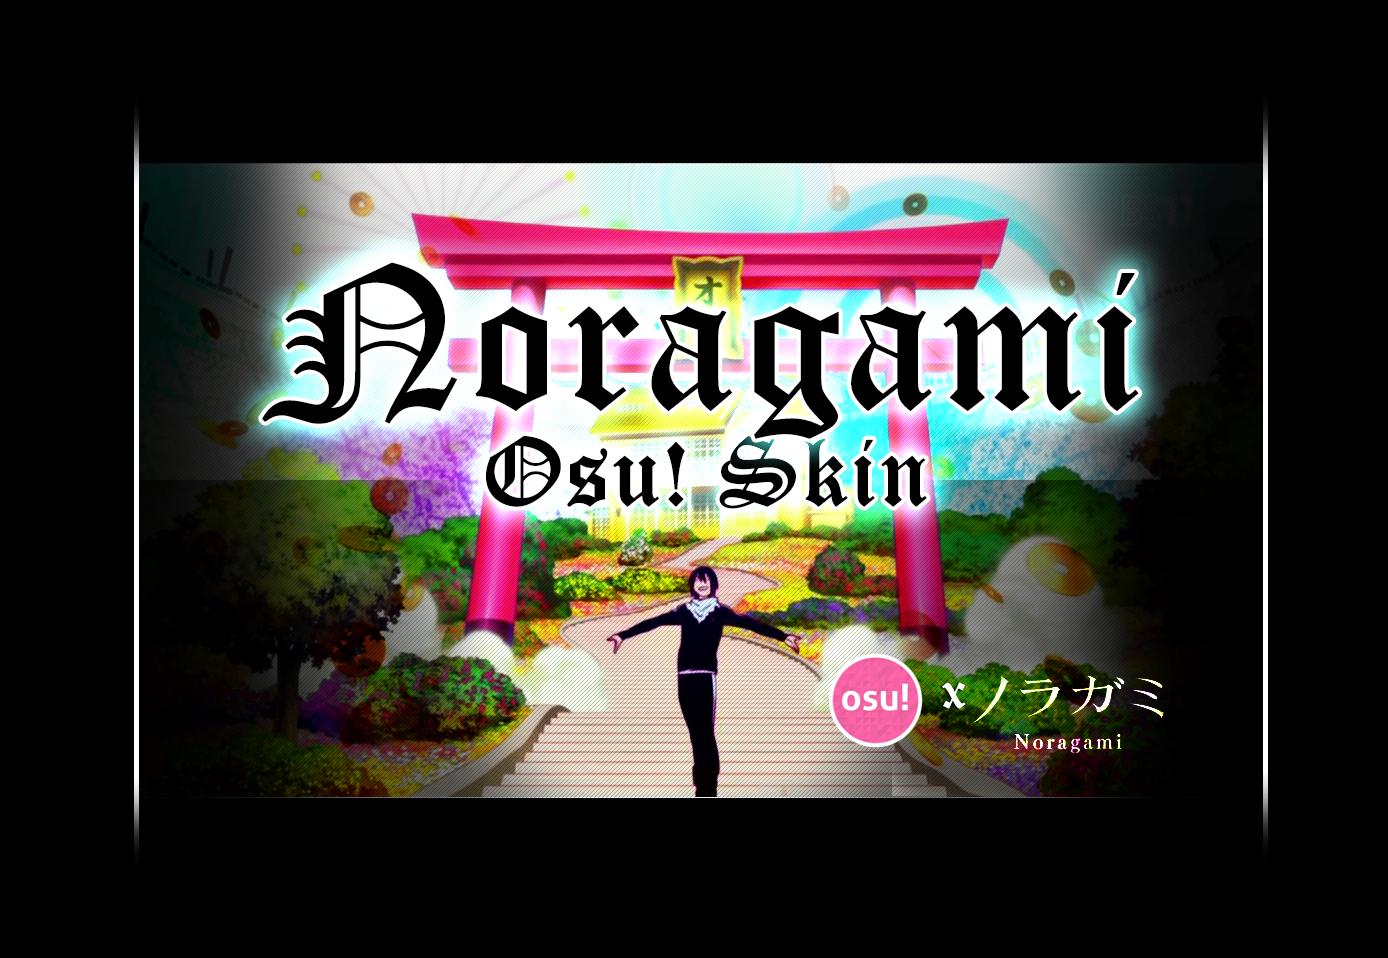 Noragami Osu!Skin by Lyra-Kizzle08 on DeviantArt